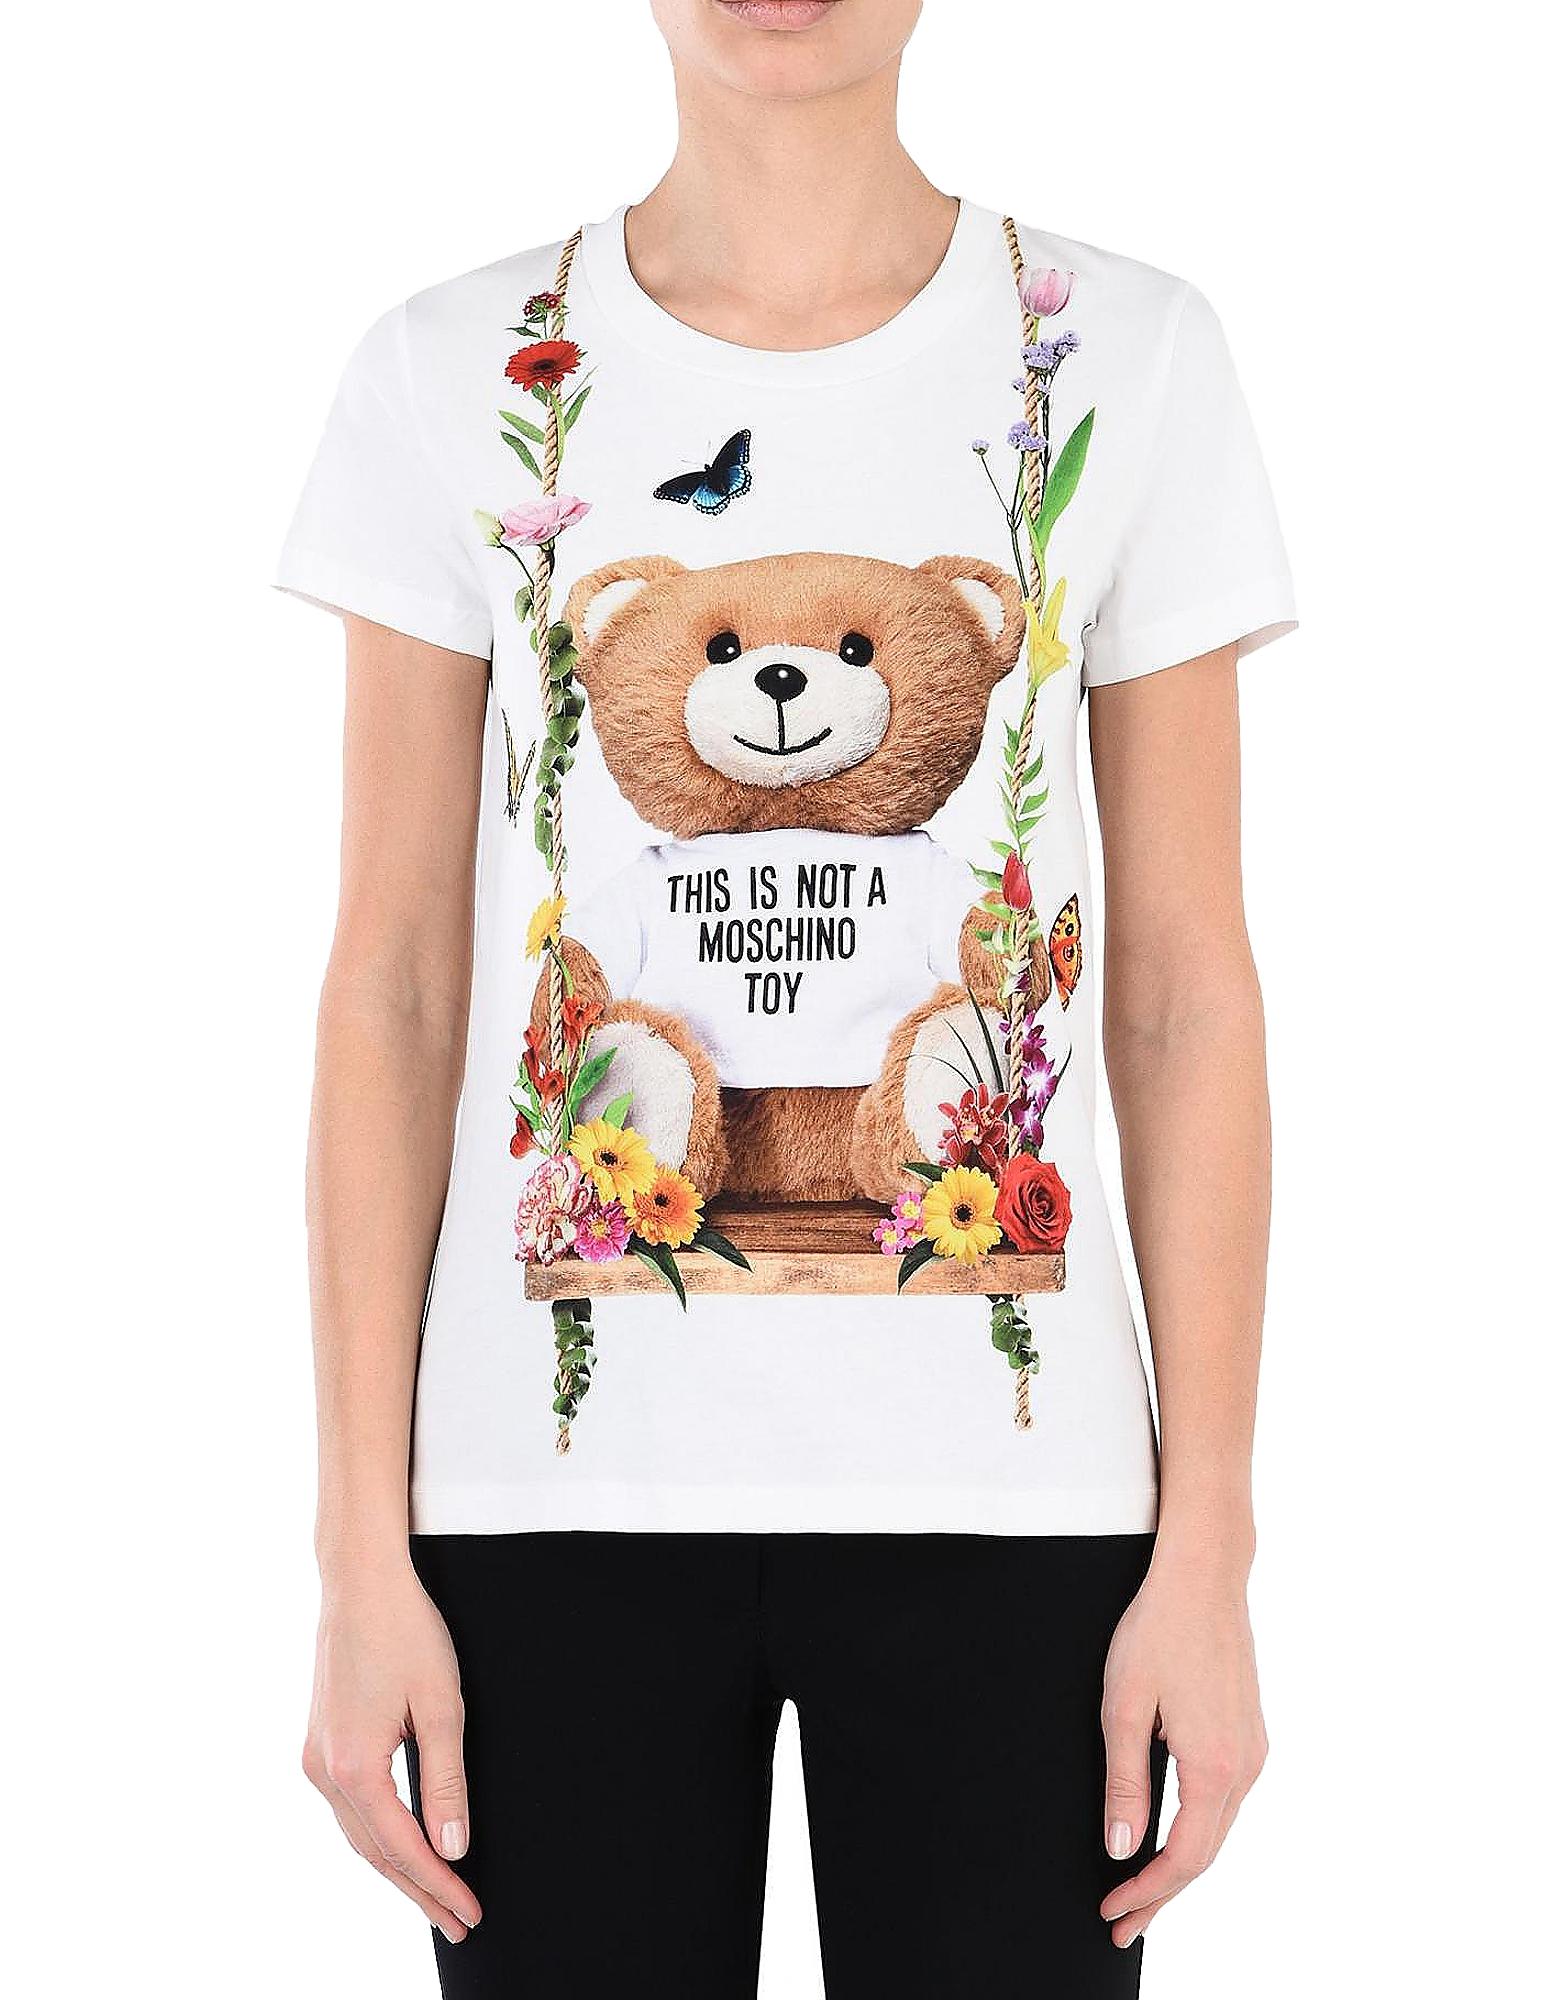 Moschino Designer T-Shirts & Tops, Teddy Bear Print White Cotton Women's T-Shirt